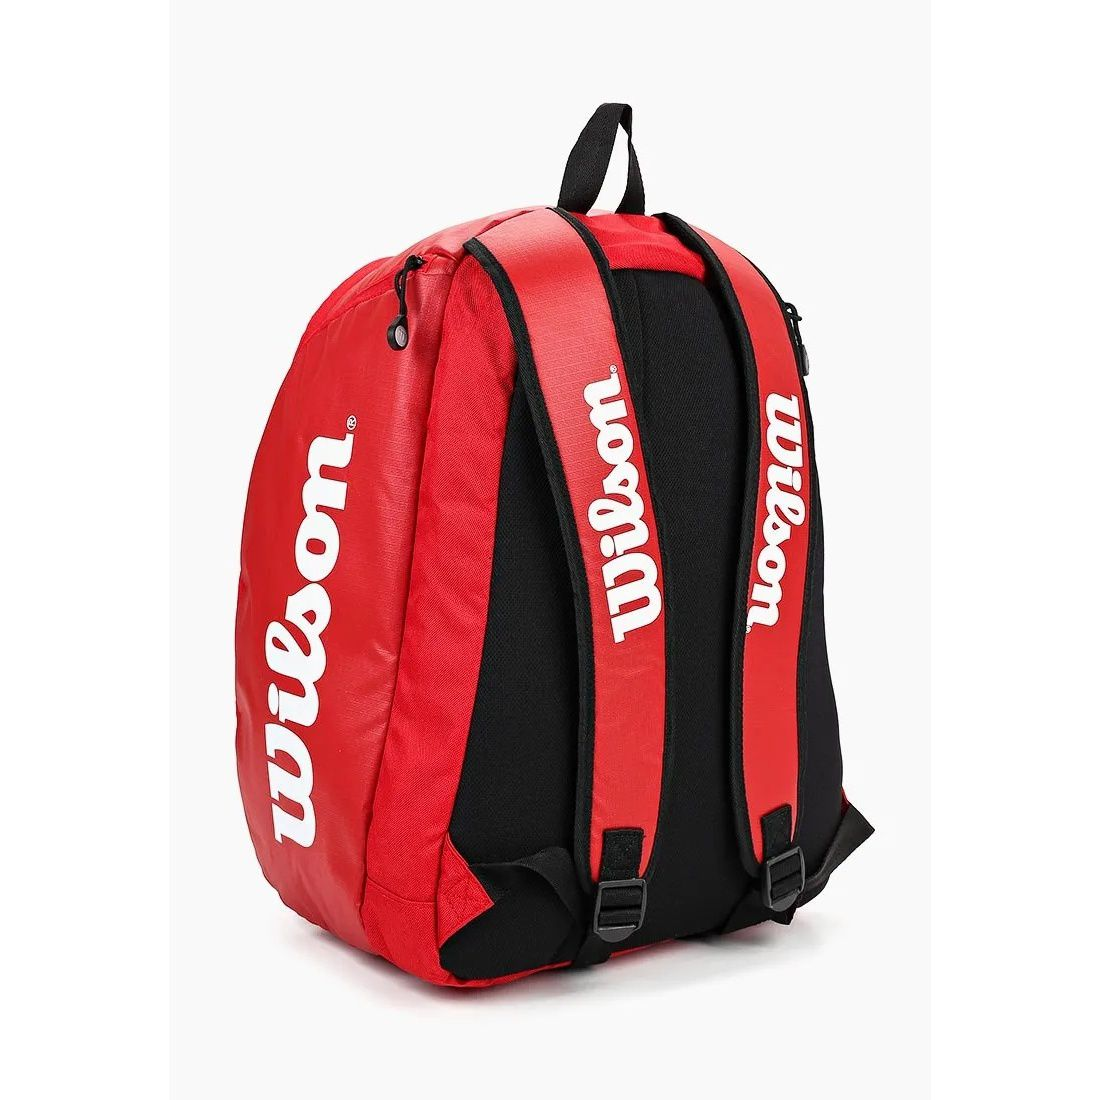 Mochila Wilson Tour Backpack Vermelha